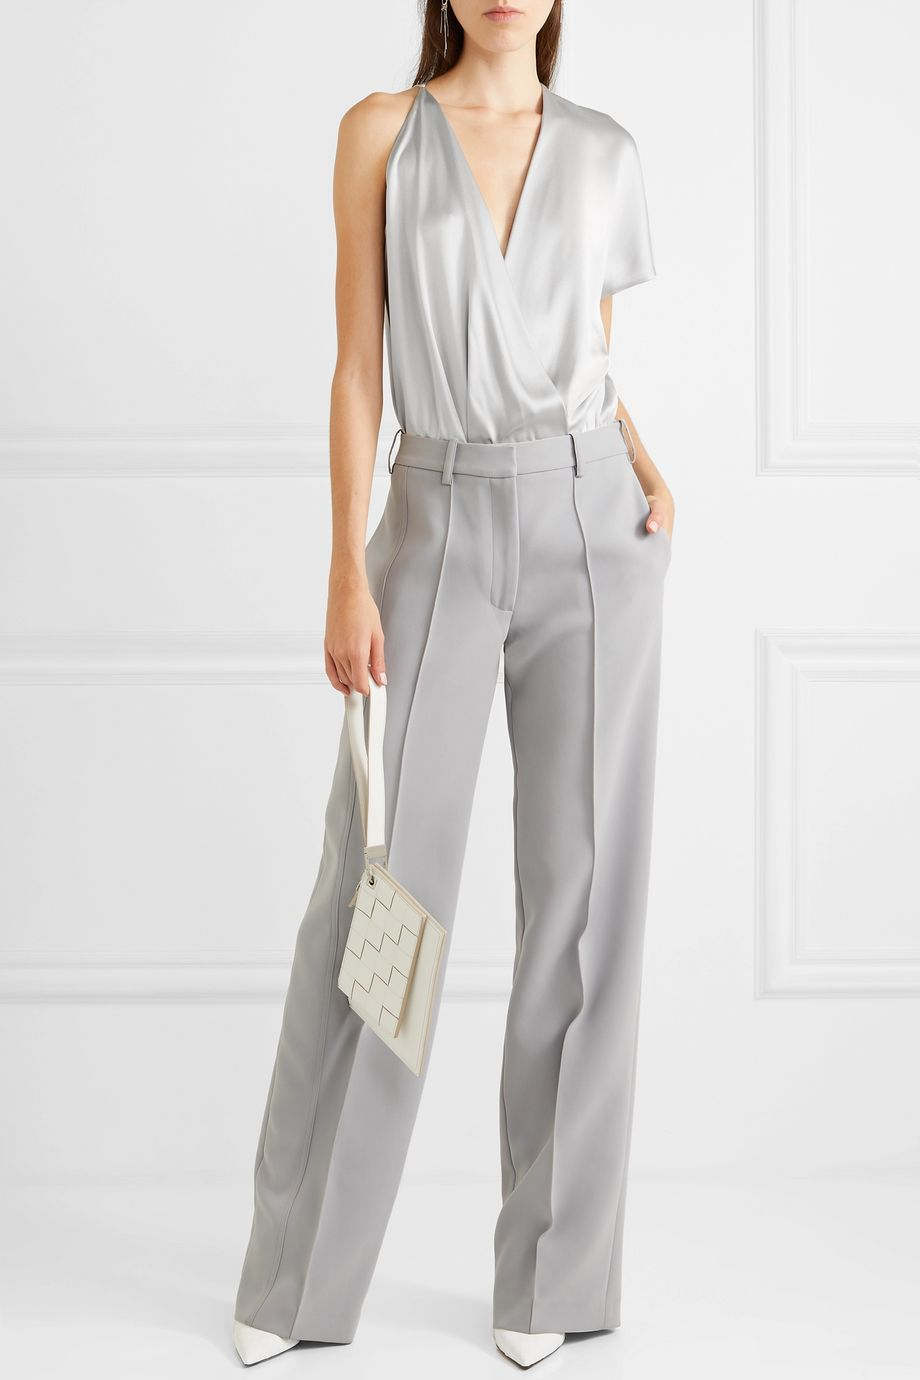 Cushnie Asymmetric silk-satin and stretch-mesh bodysuit